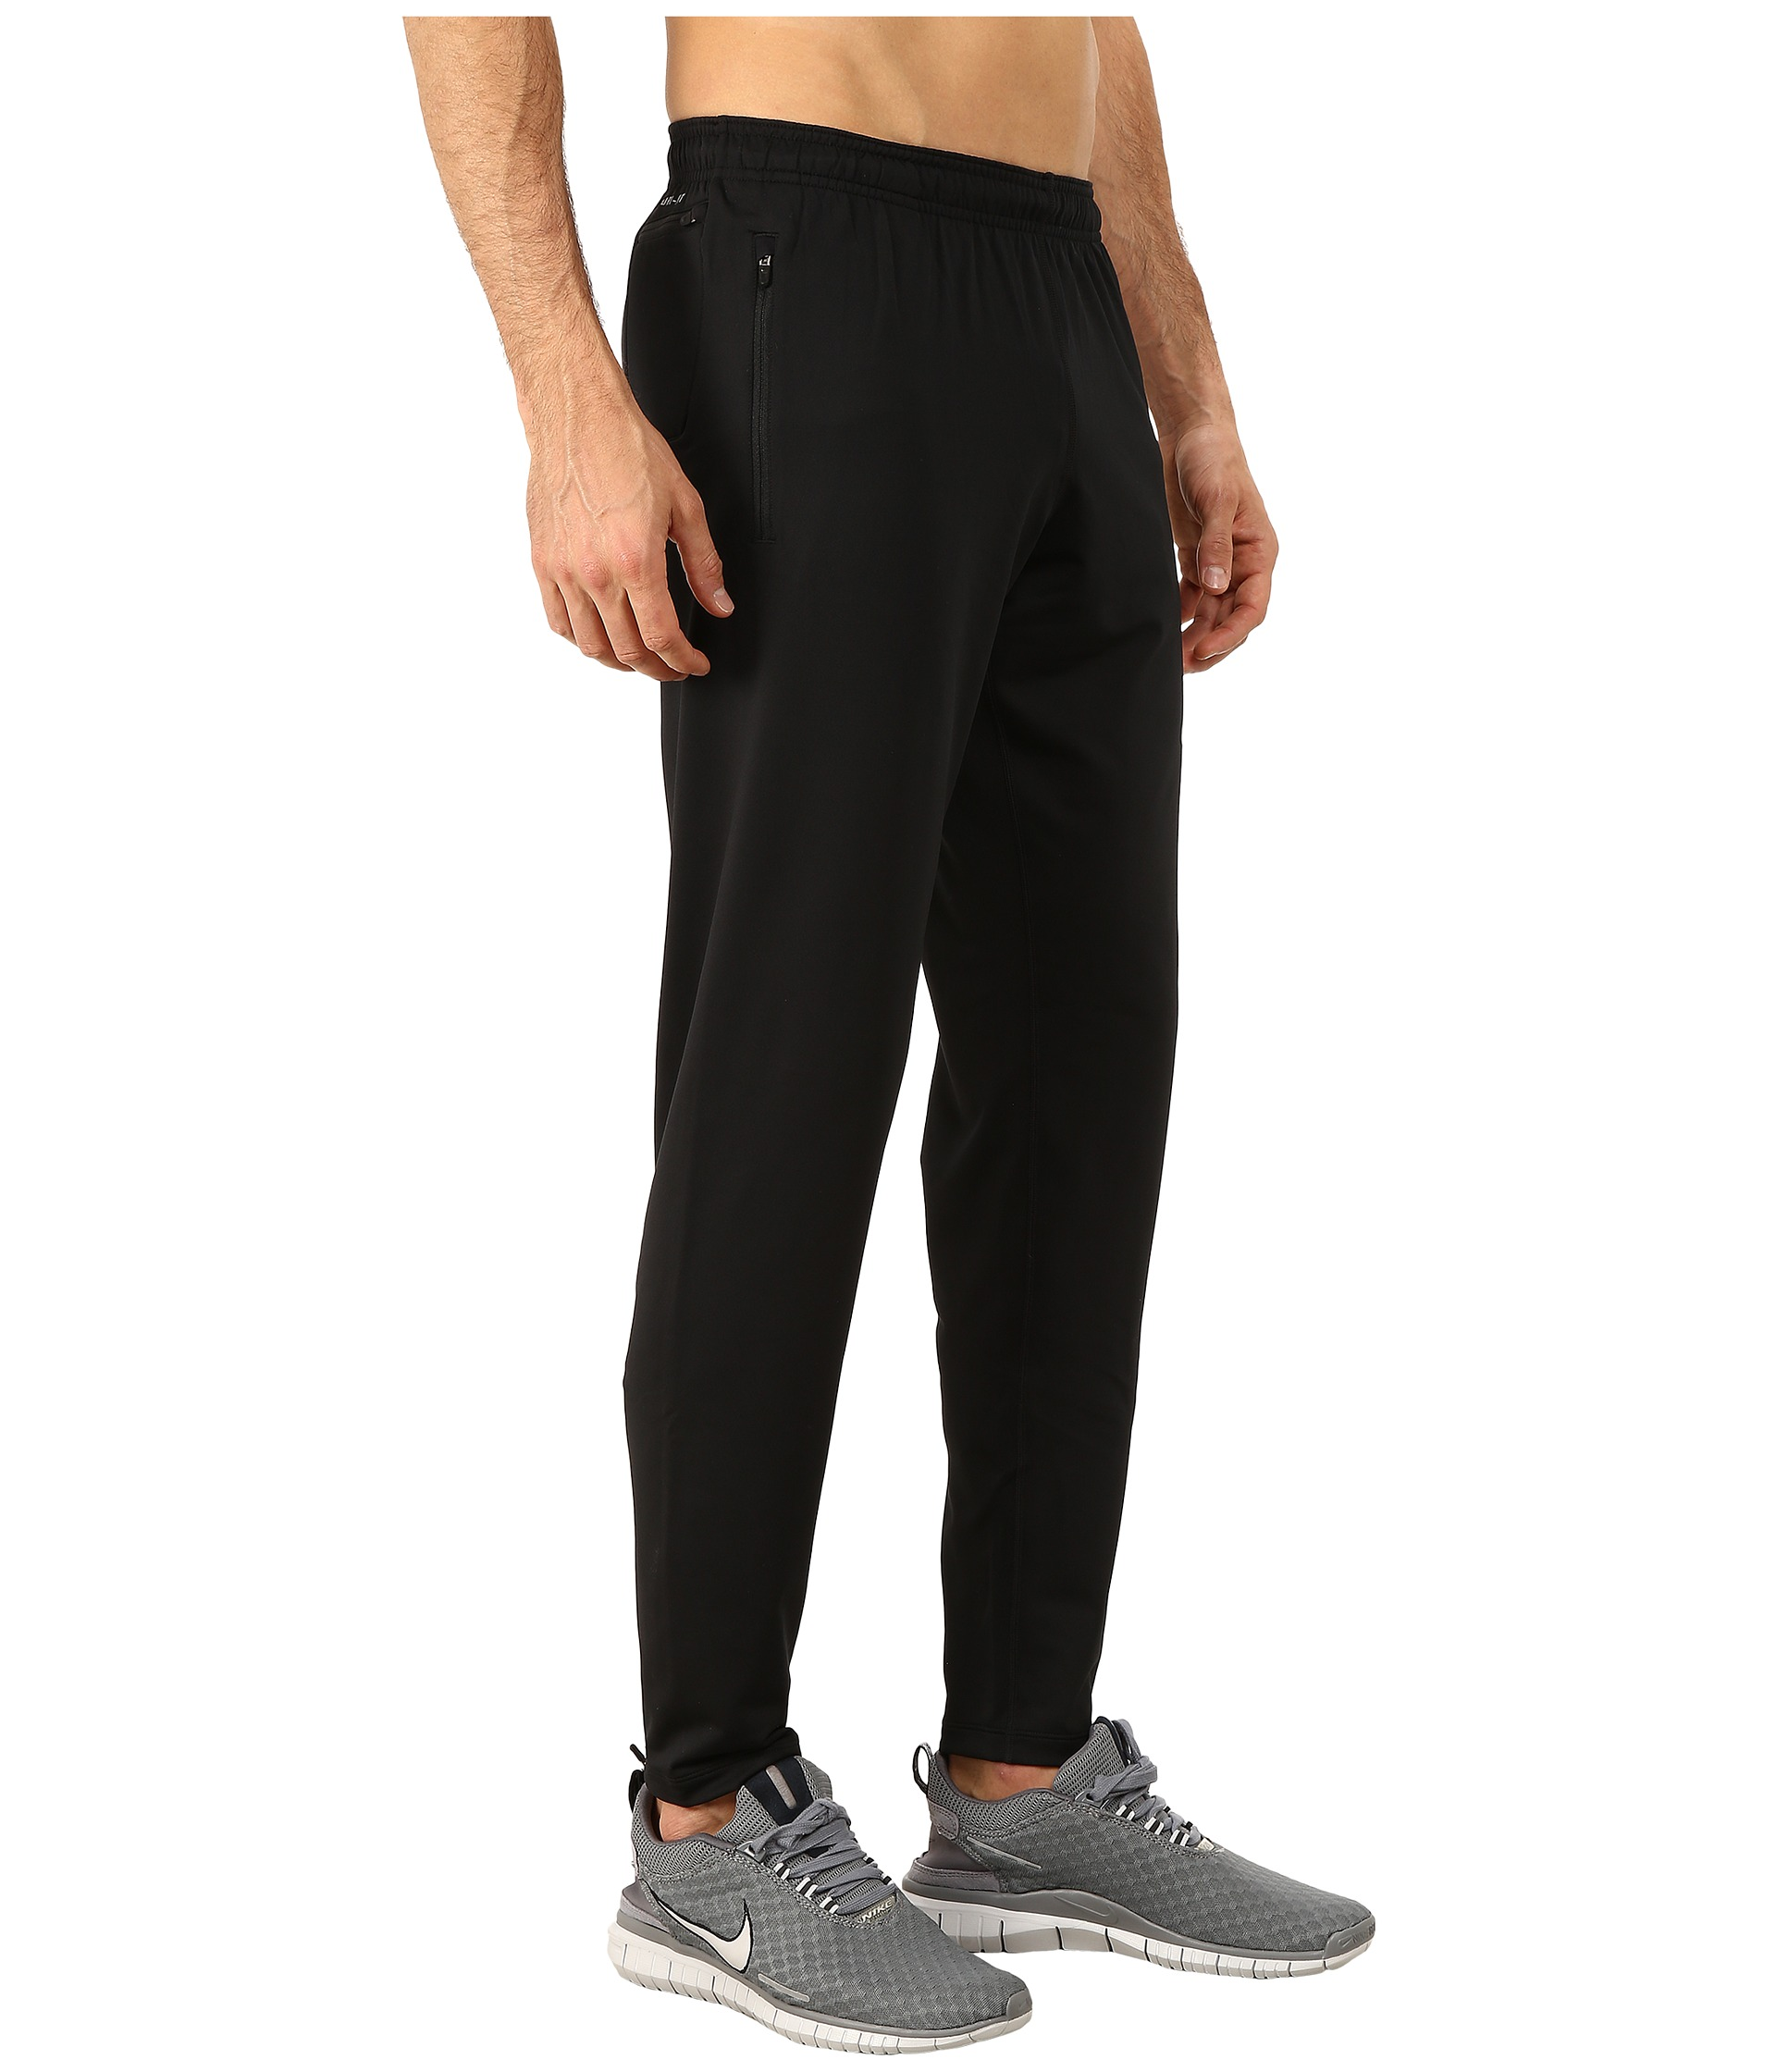 Fantastic Nike Revolution 2 Womens Running Shoes | Amazon.com